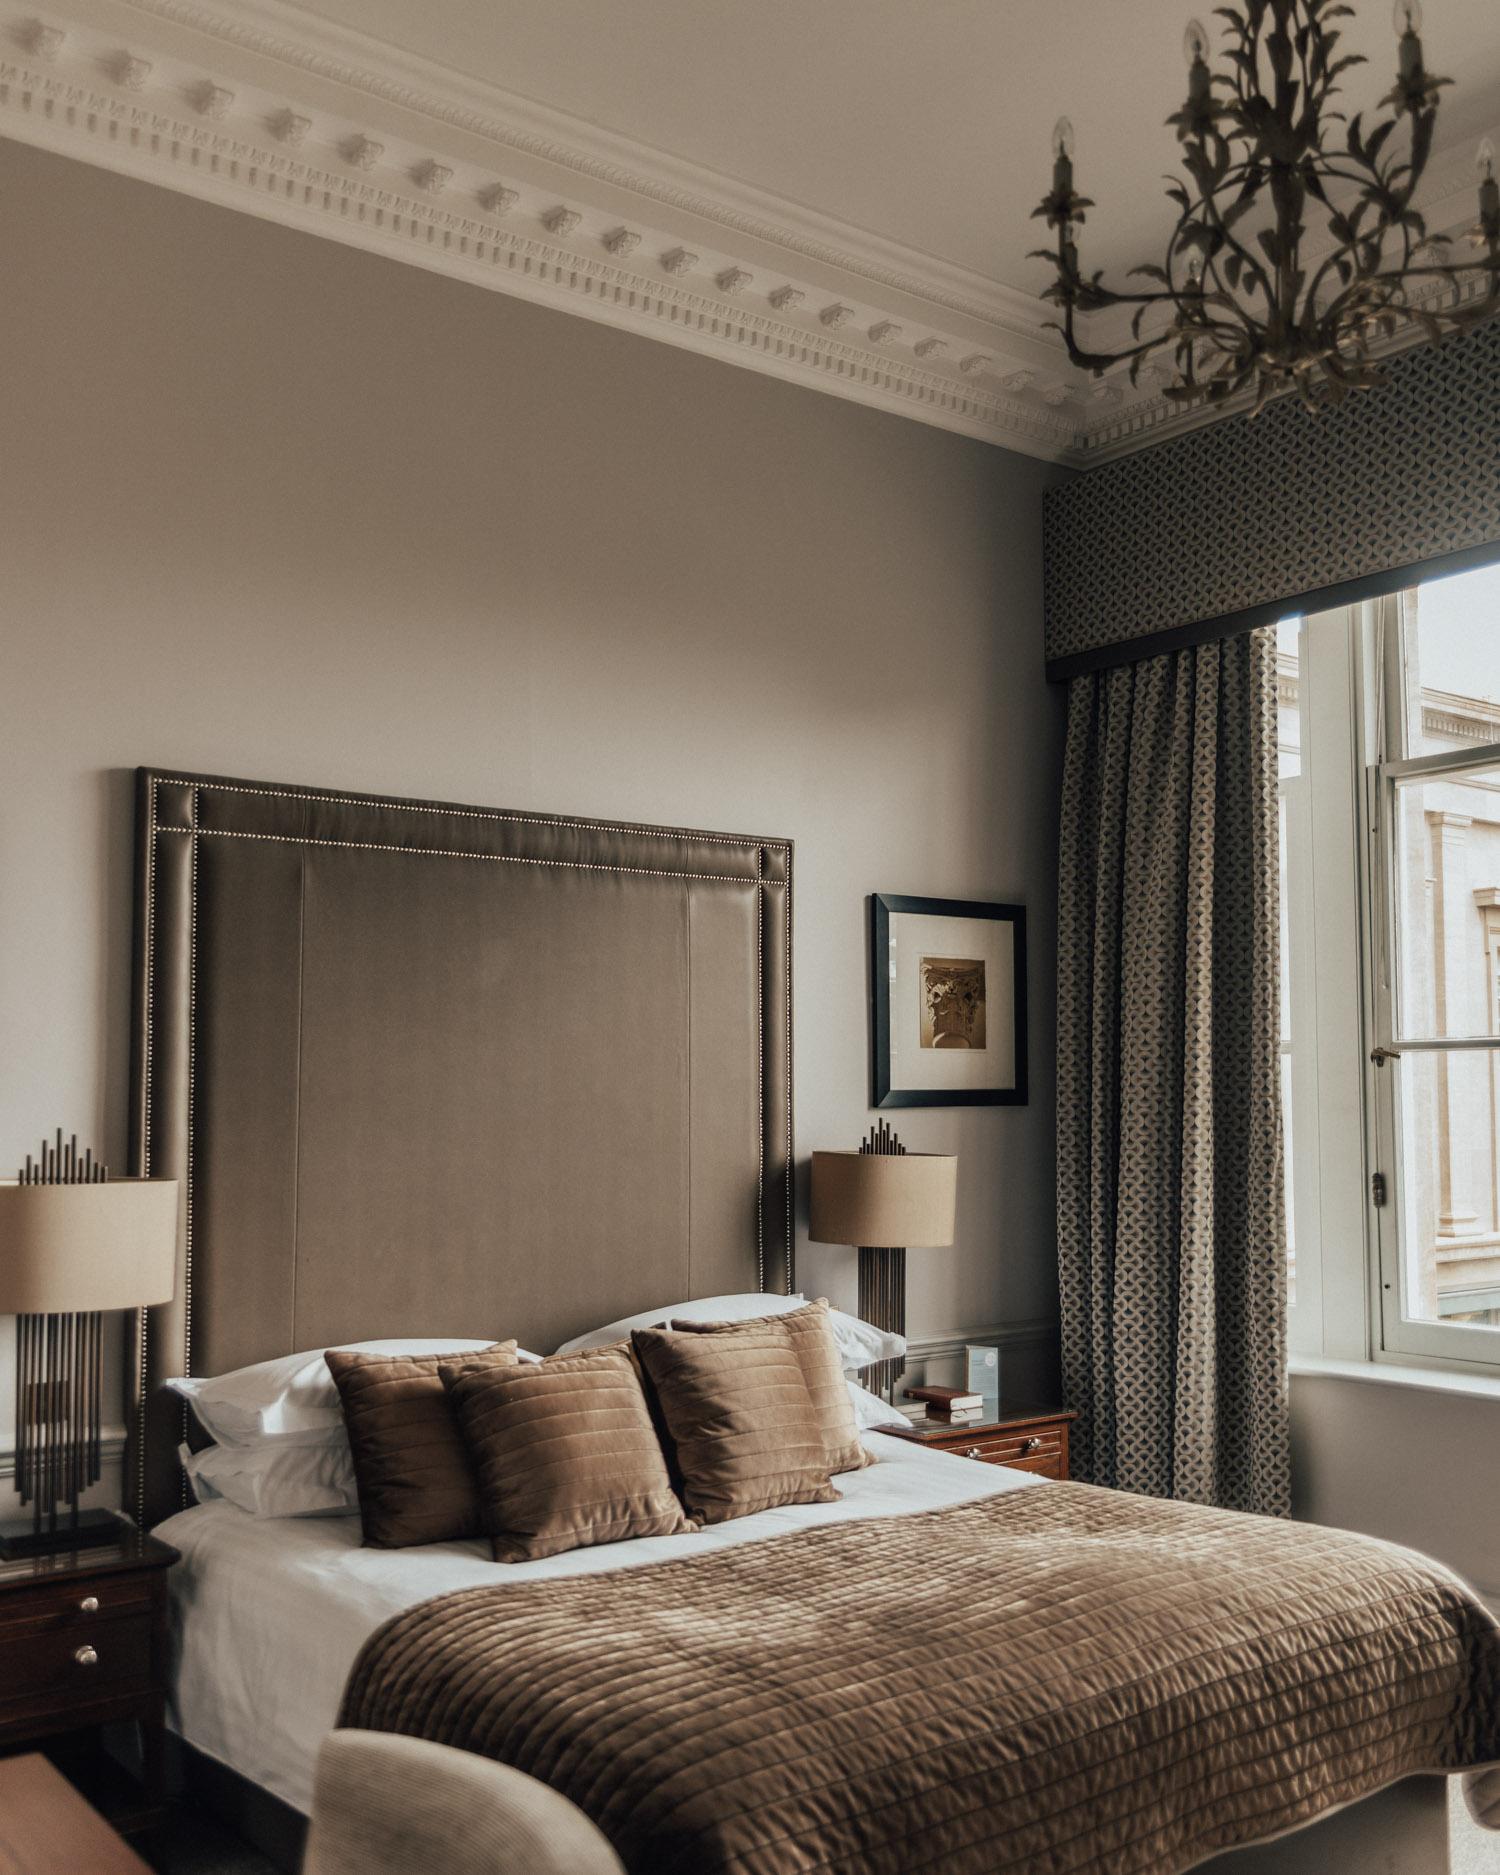 Room at Macdonald Bath Spa Hotel